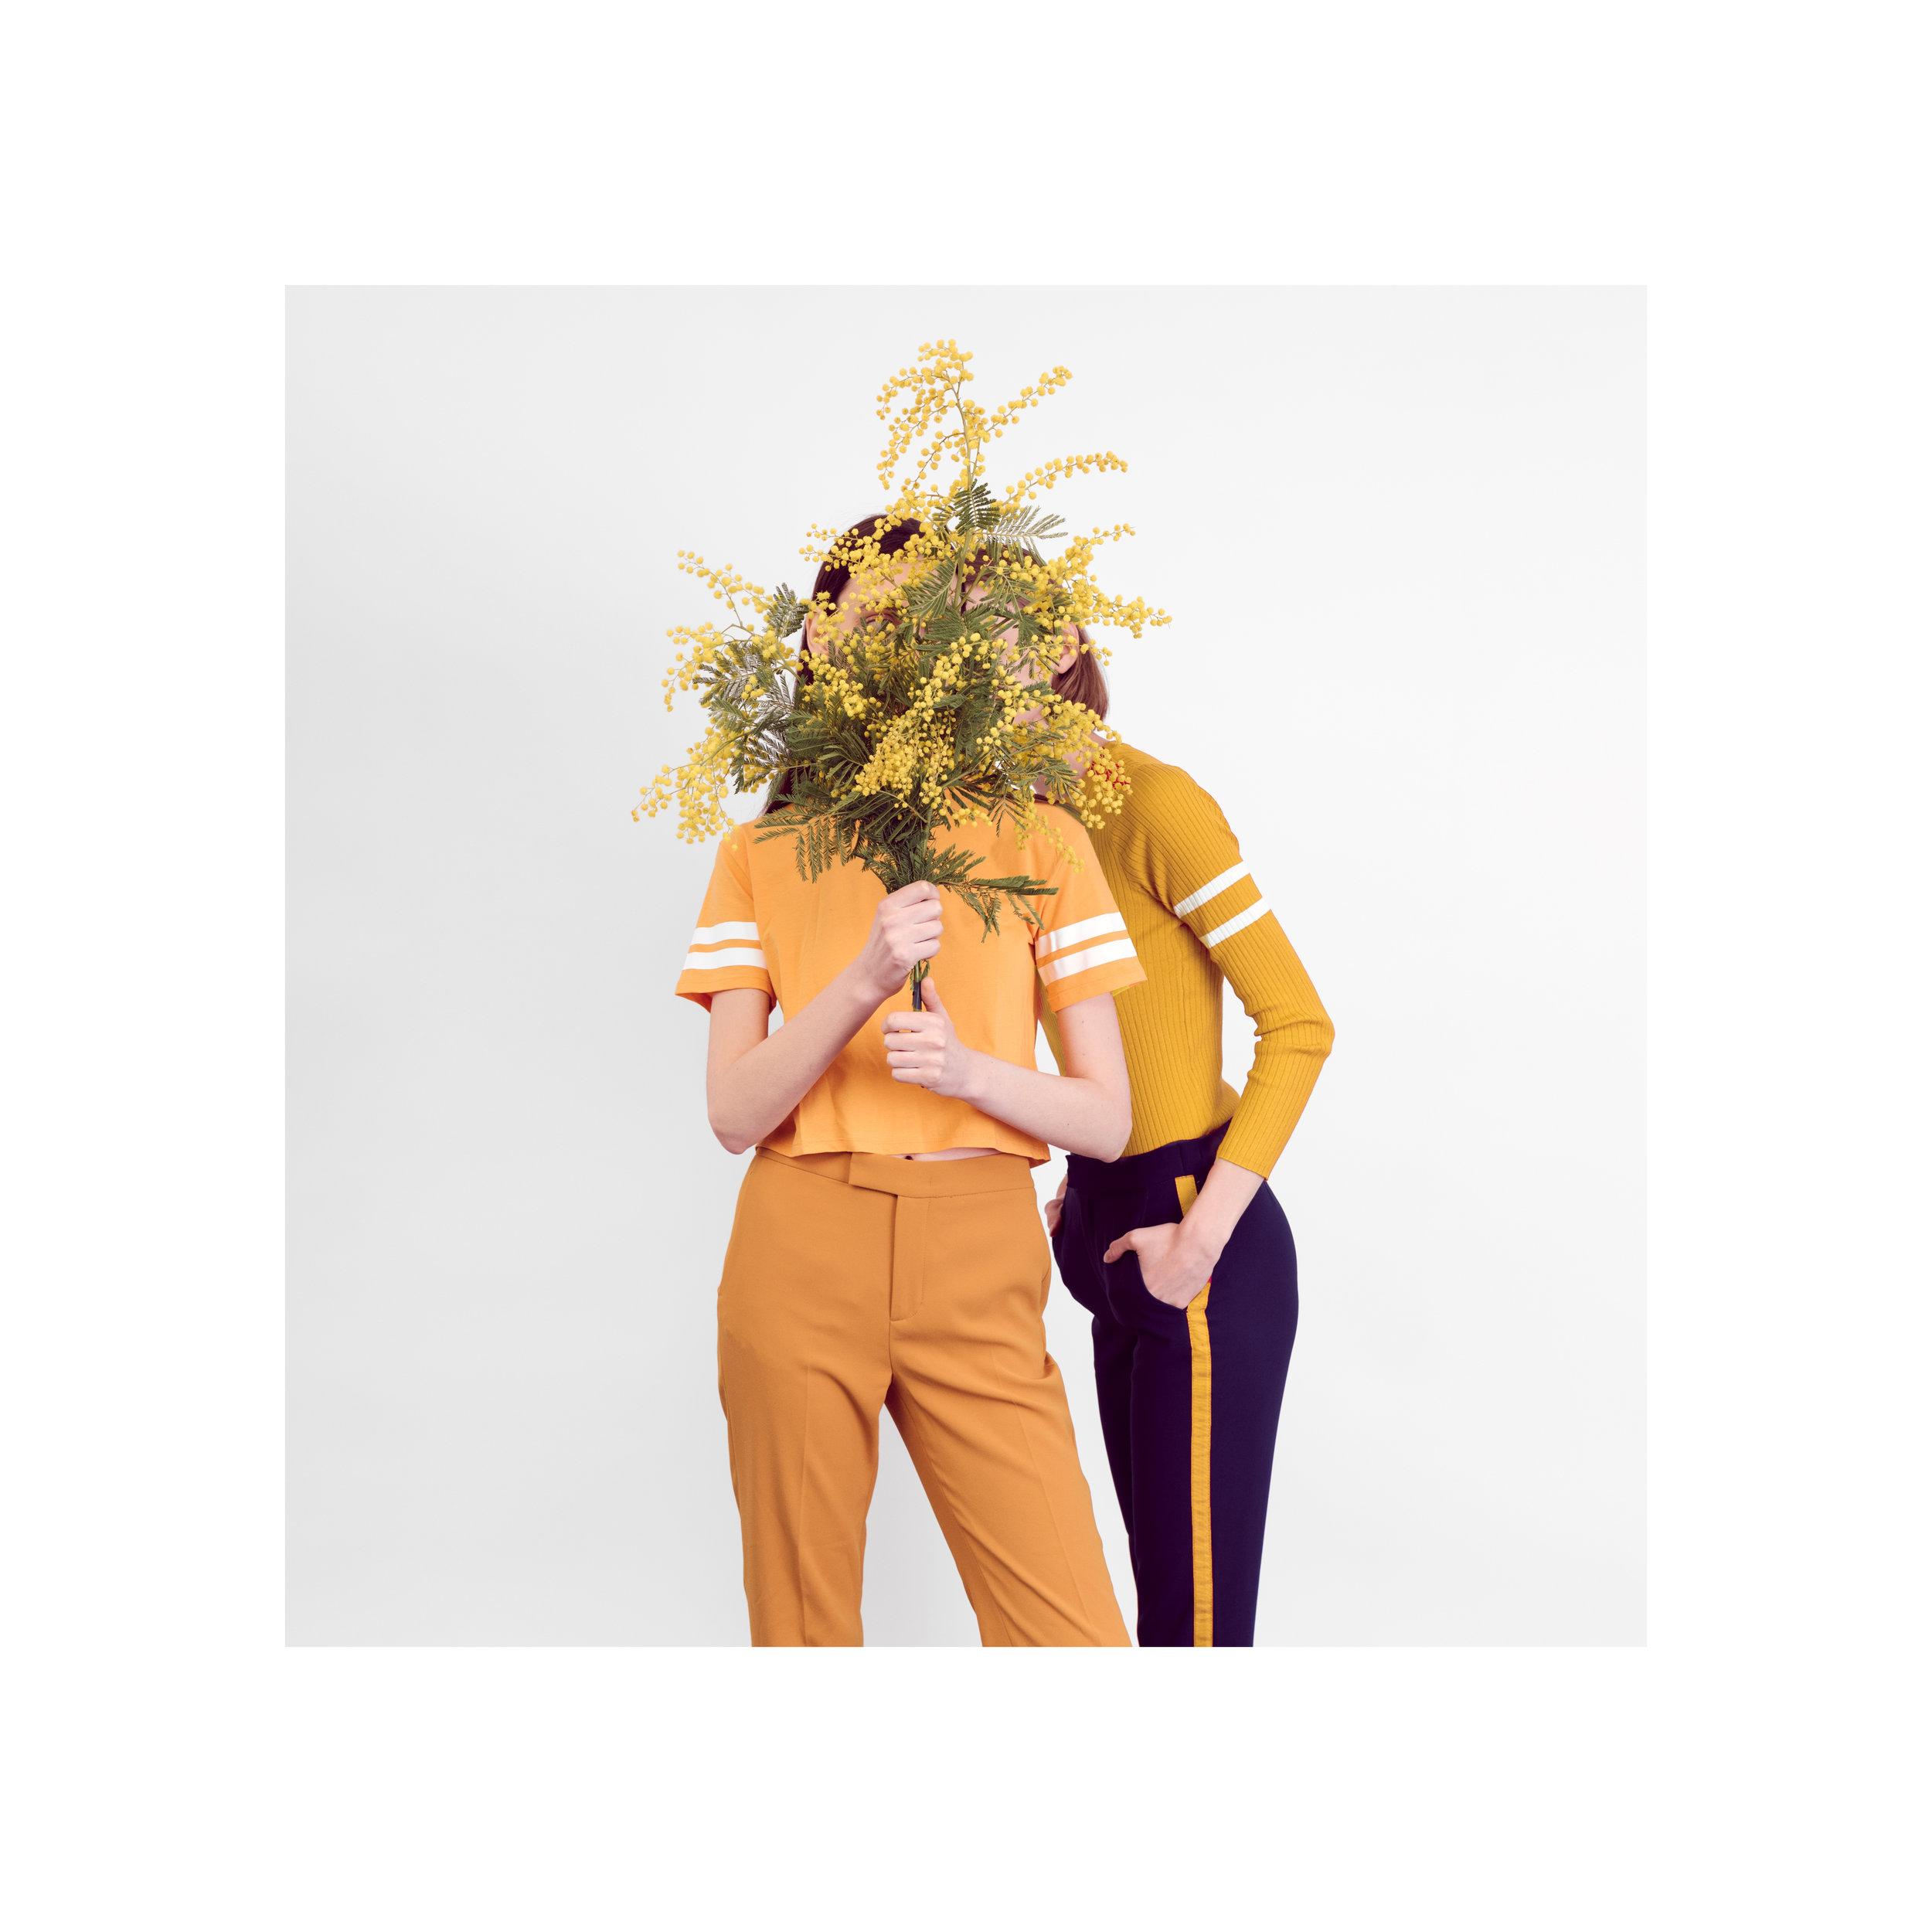 doubleflowersquare.jpg